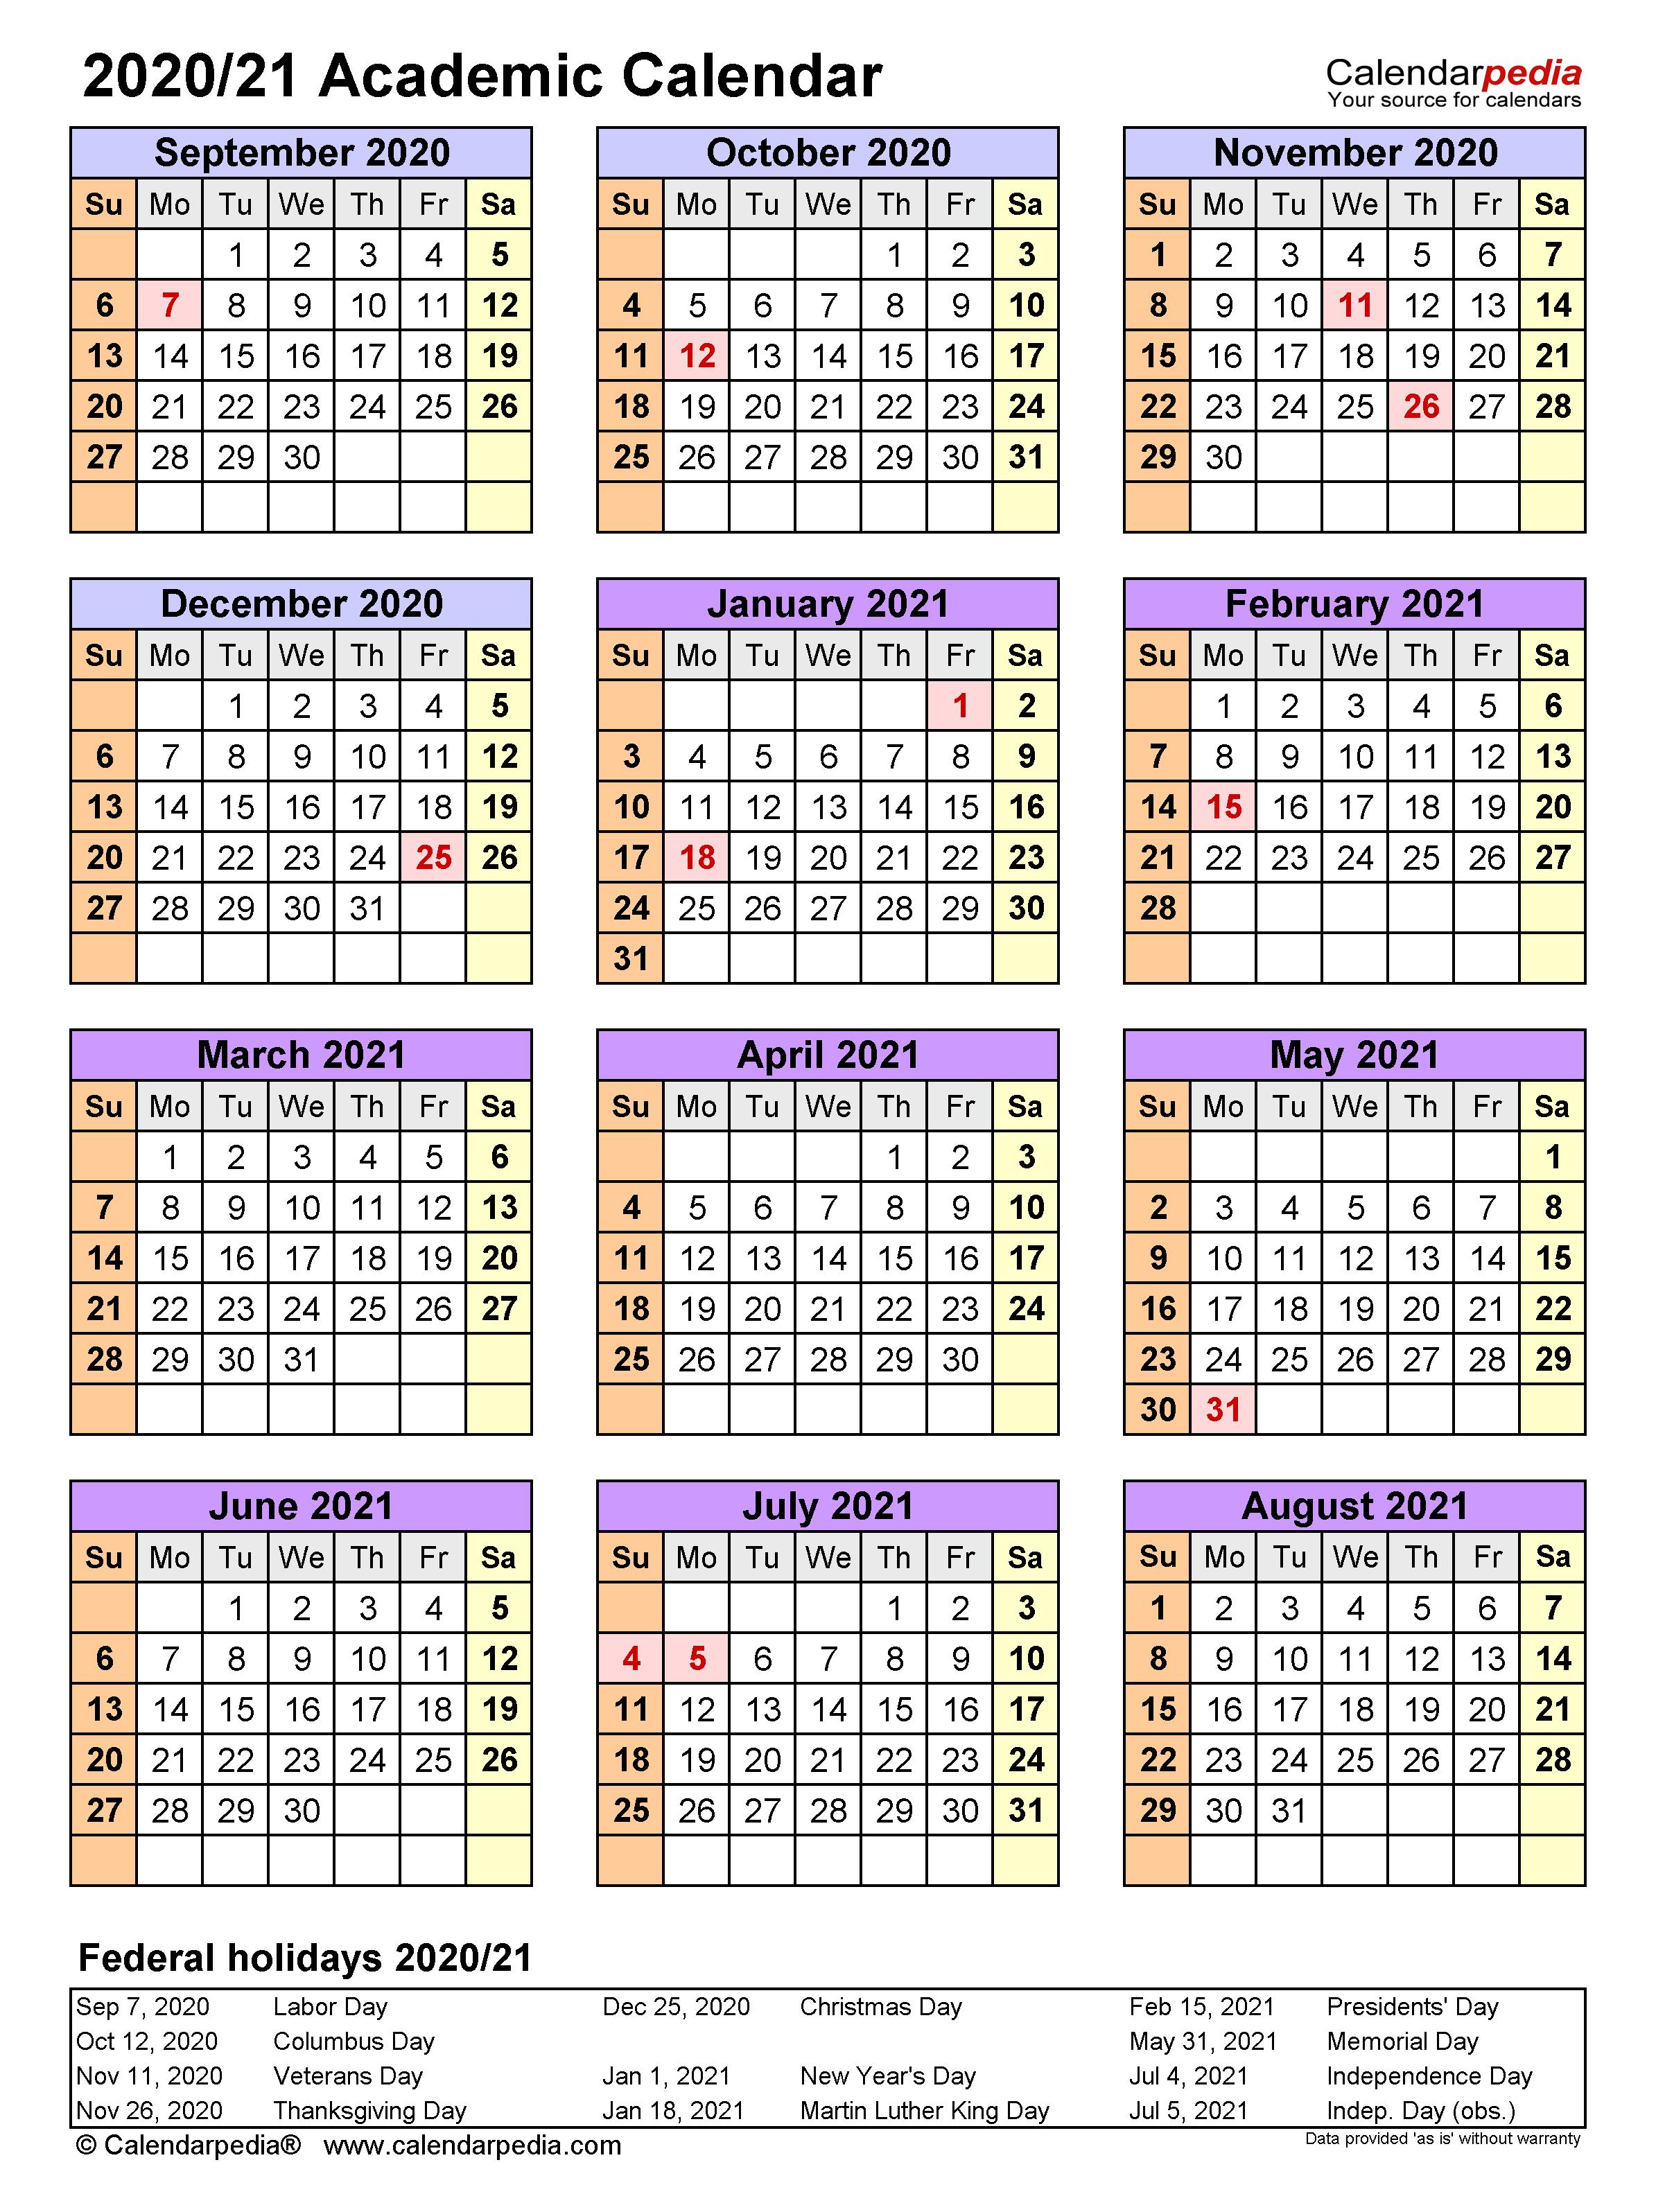 Academic Calendars 2020/2021 - Free Printable Excel Templates Regarding Uri Academic Calendar 2021 2020